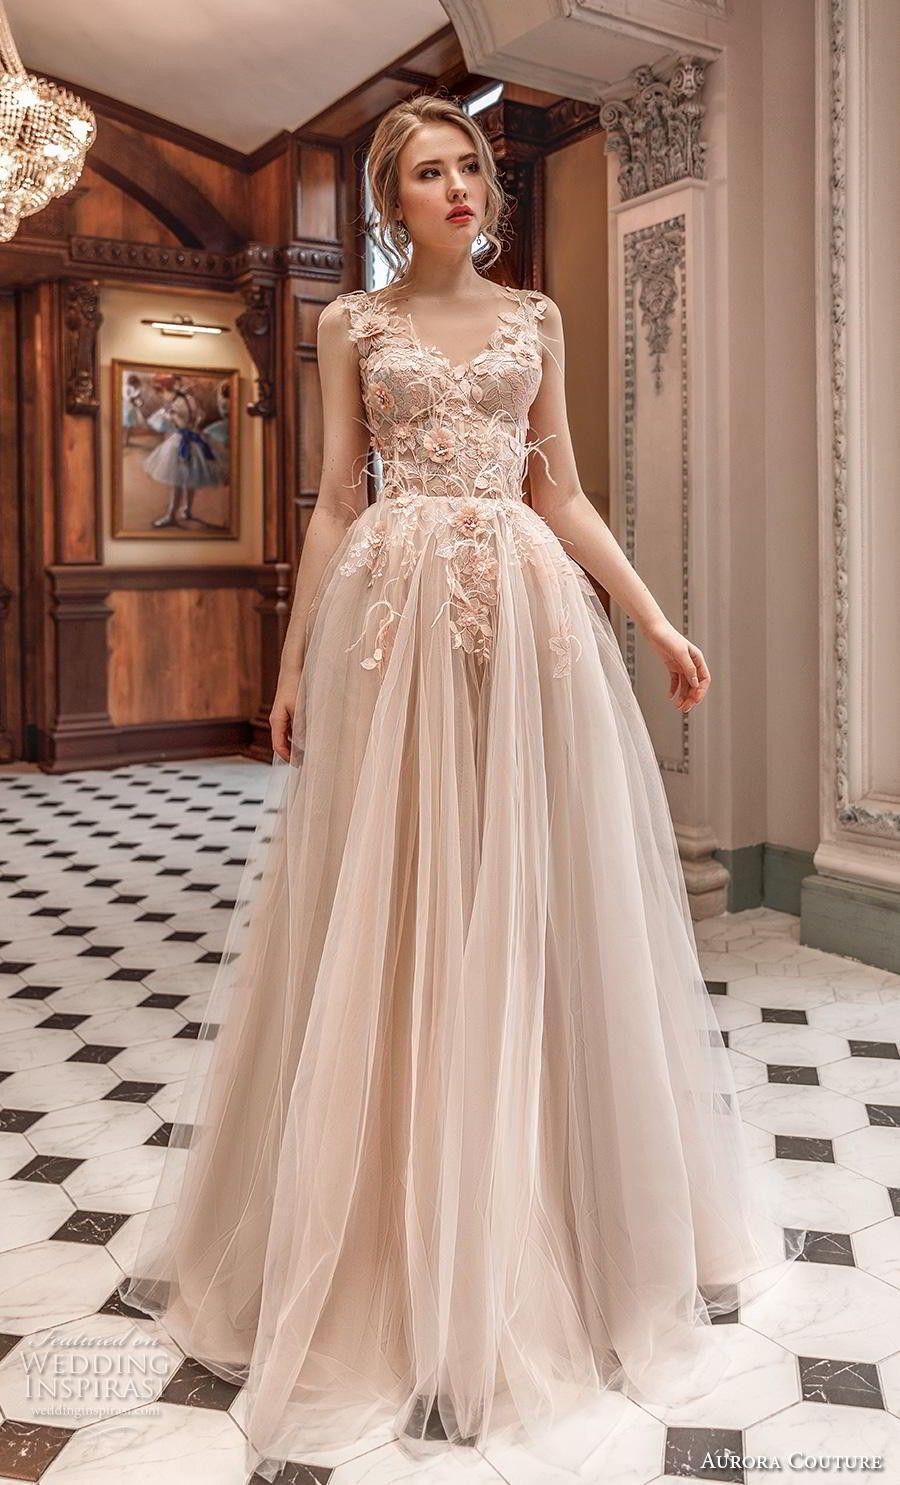 Oksana Mukha Cocktail Dresses Collection And Magic Finishes